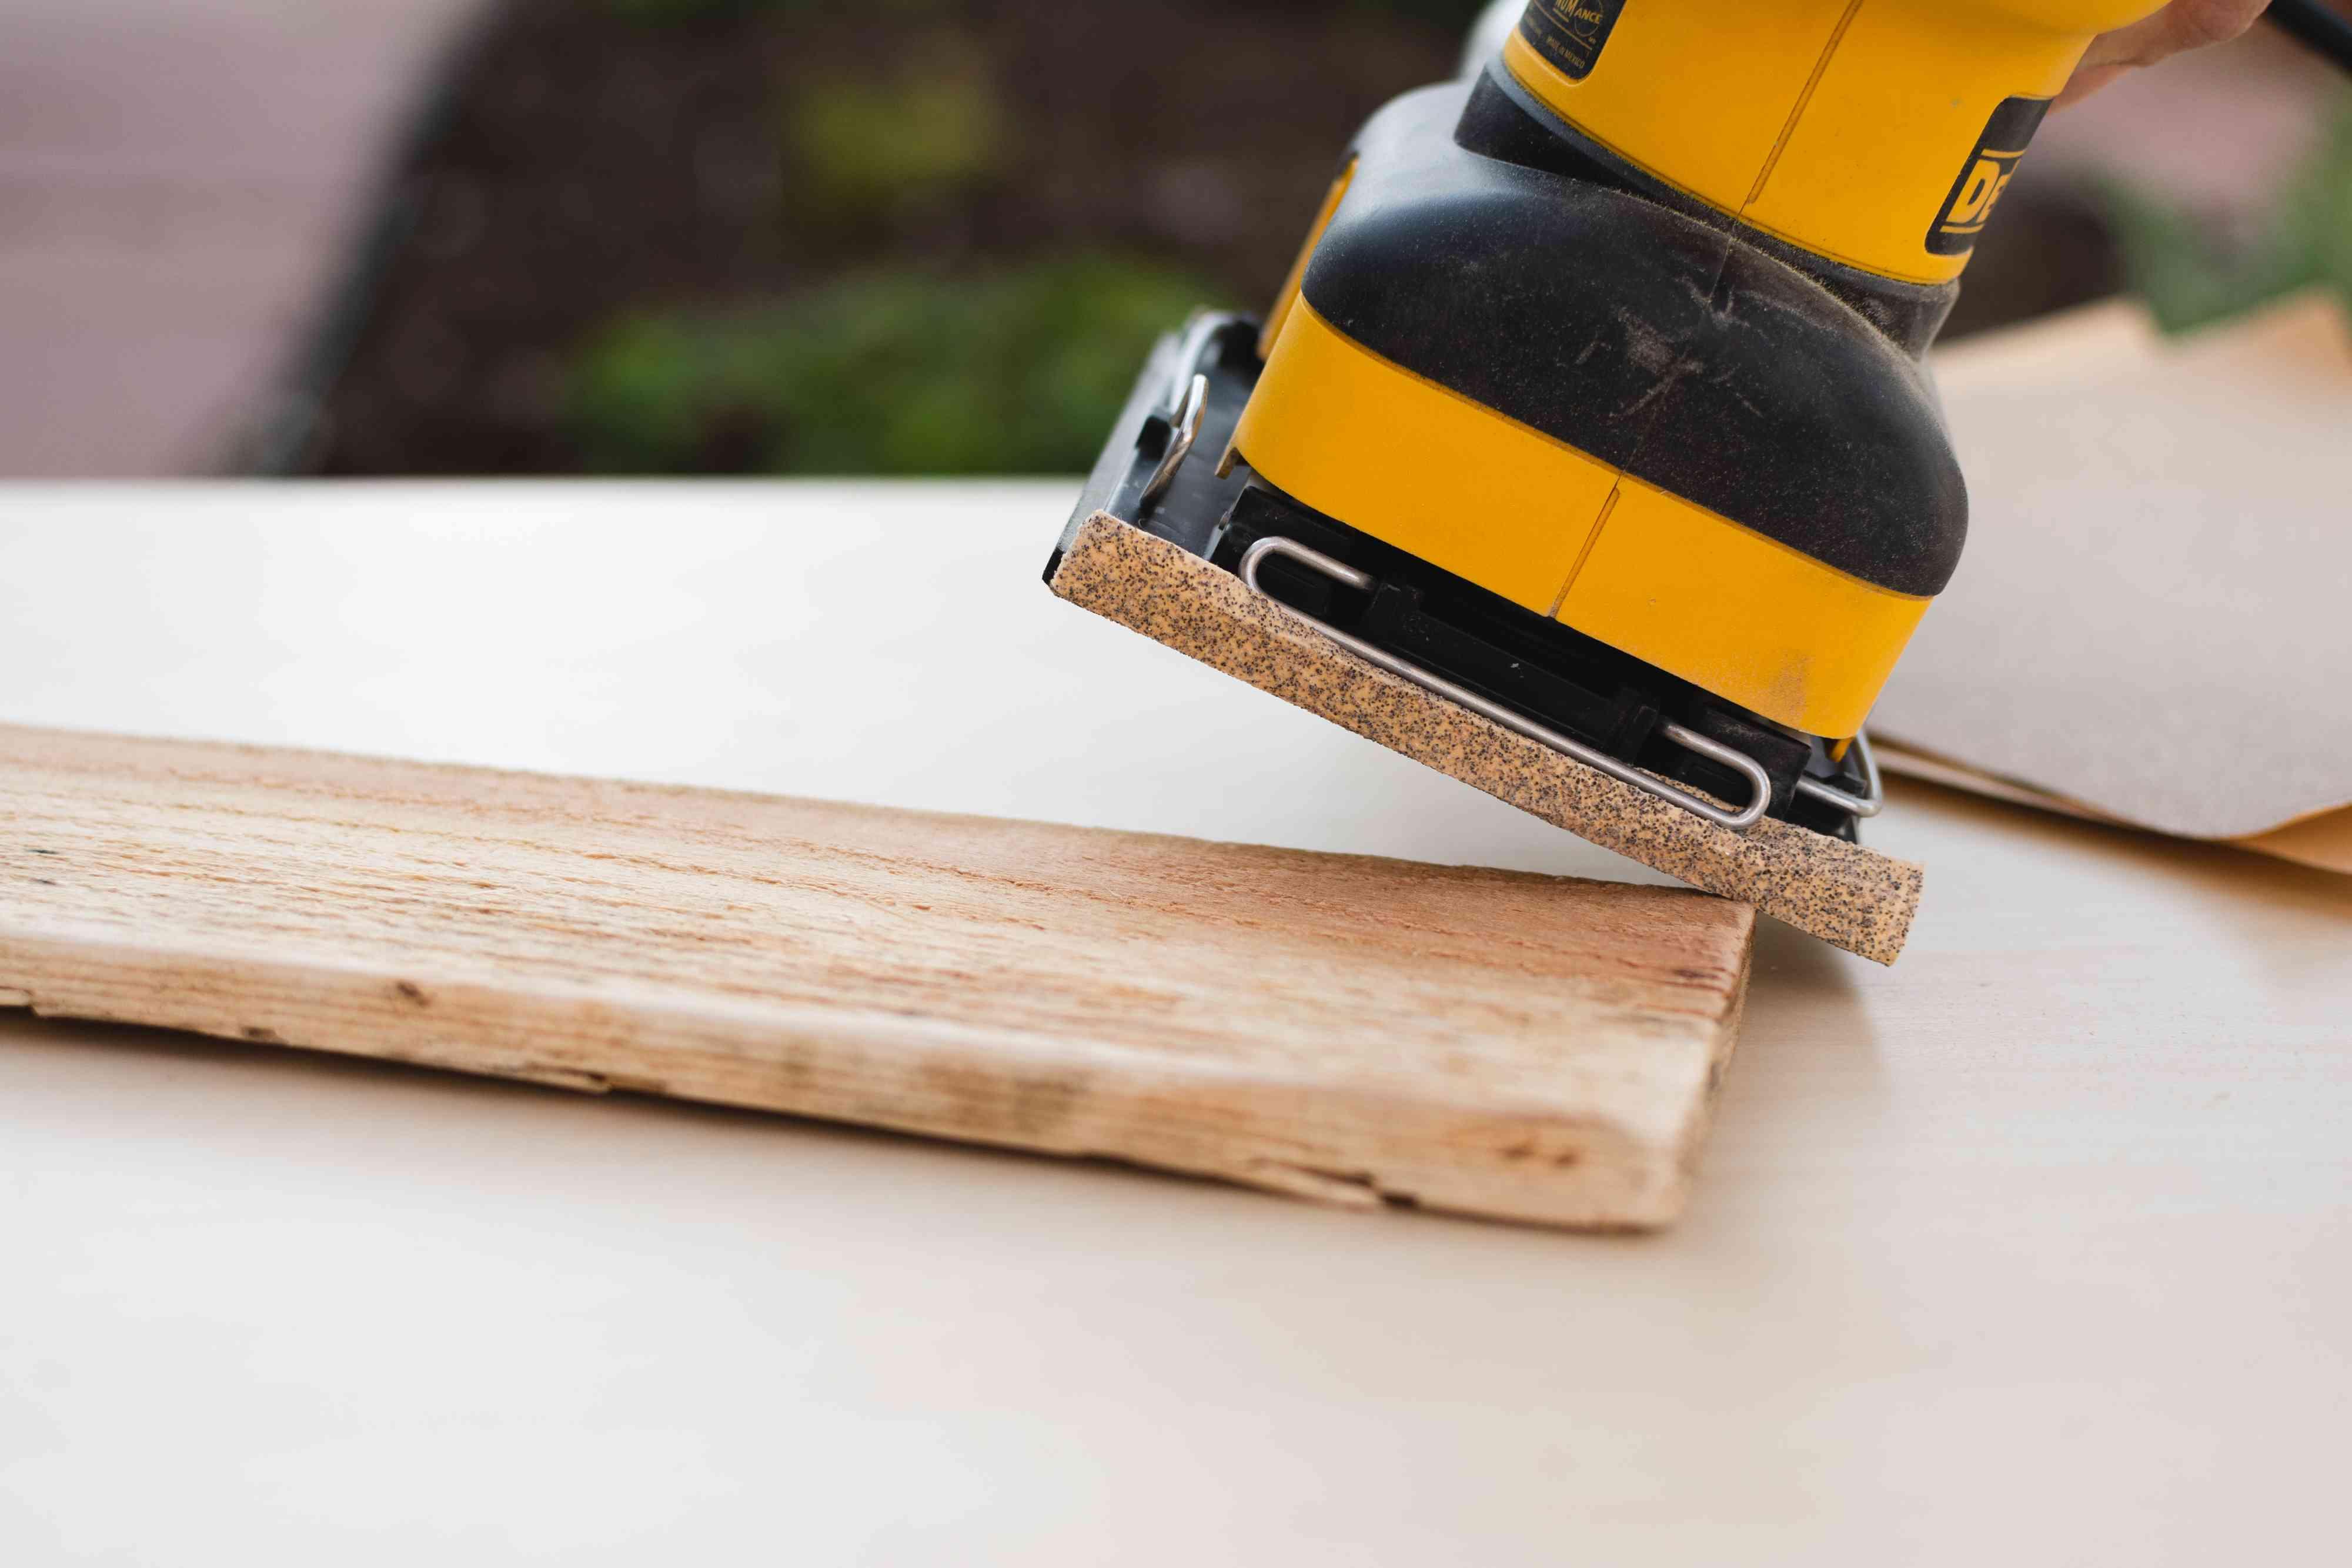 Sander rounding off edge of wooden plank